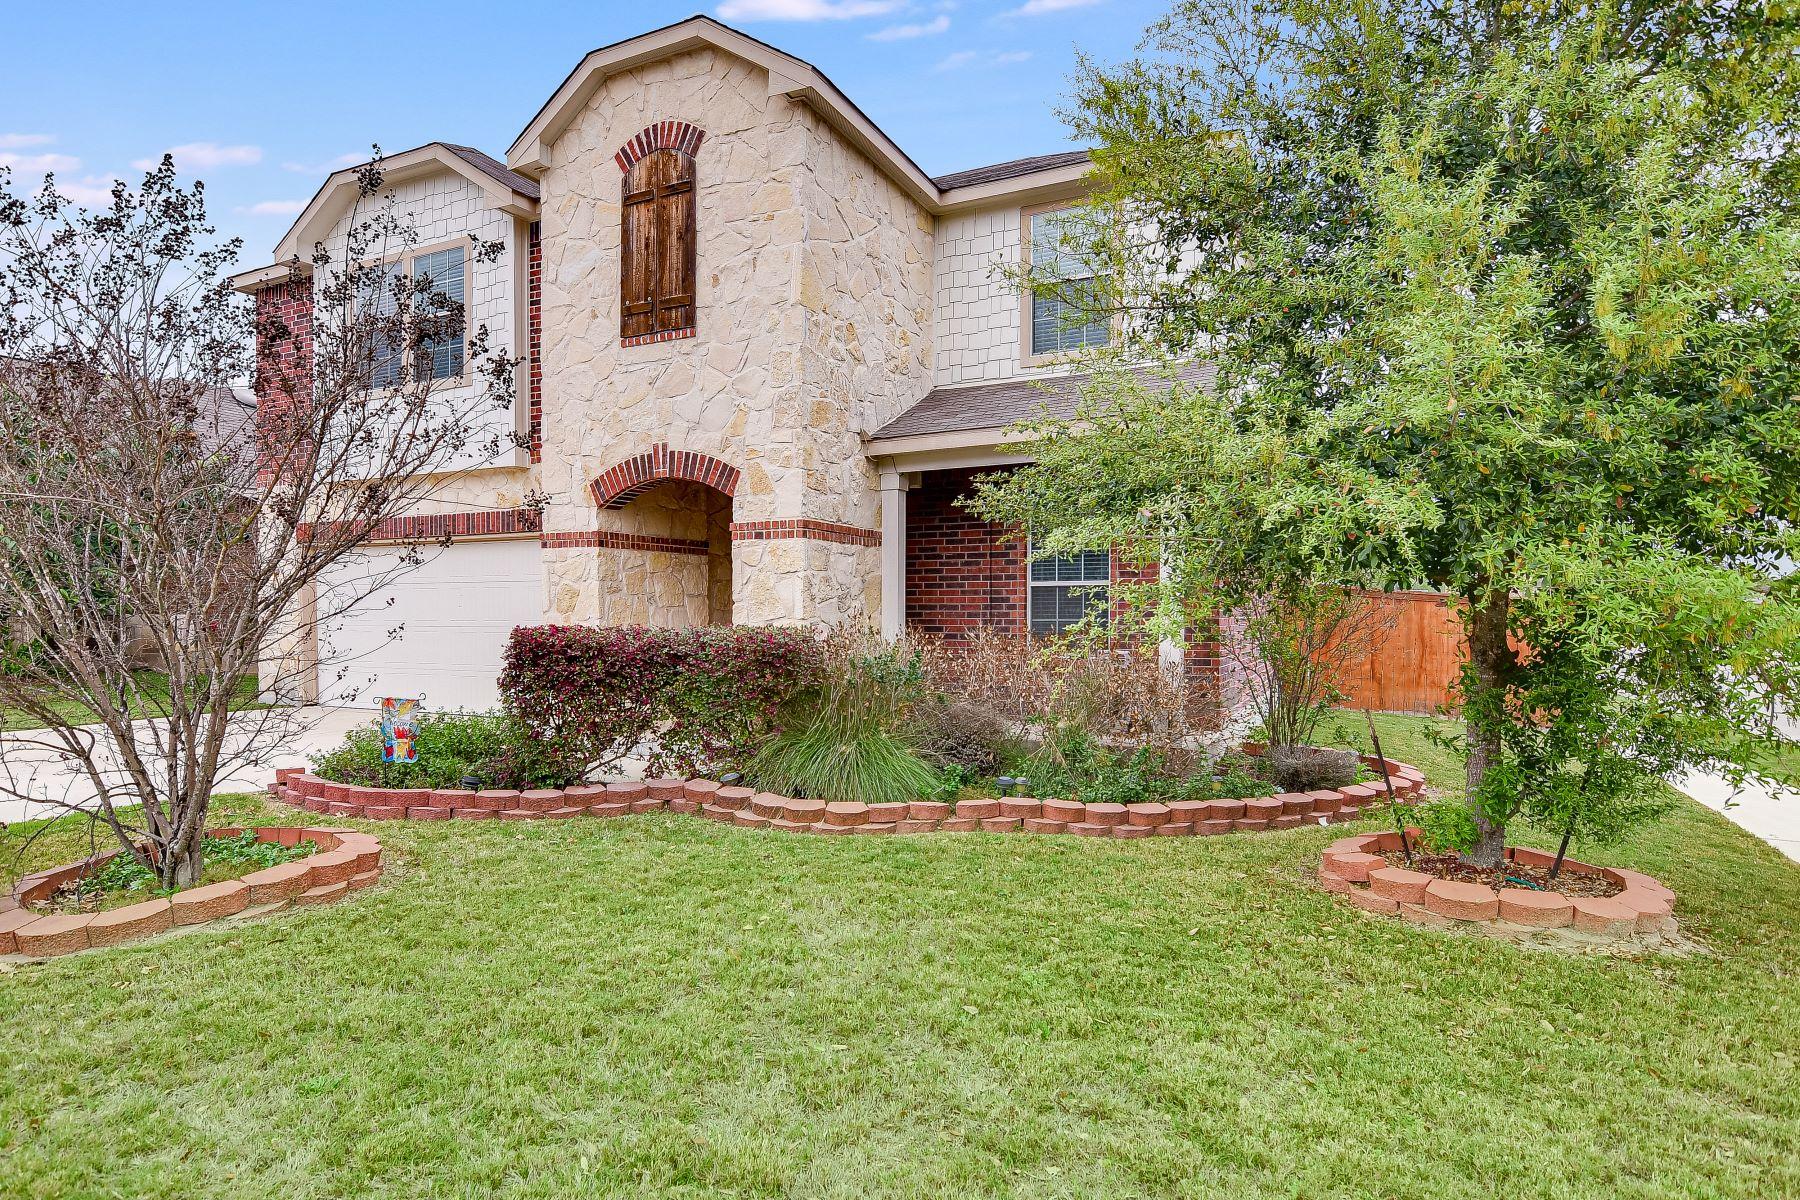 Single Family Homes für Verkauf beim Beautifully Maintained Home In Cibolo Valley Ranch 200 Rawhide Way, Cibolo, Texas 78108 Vereinigte Staaten